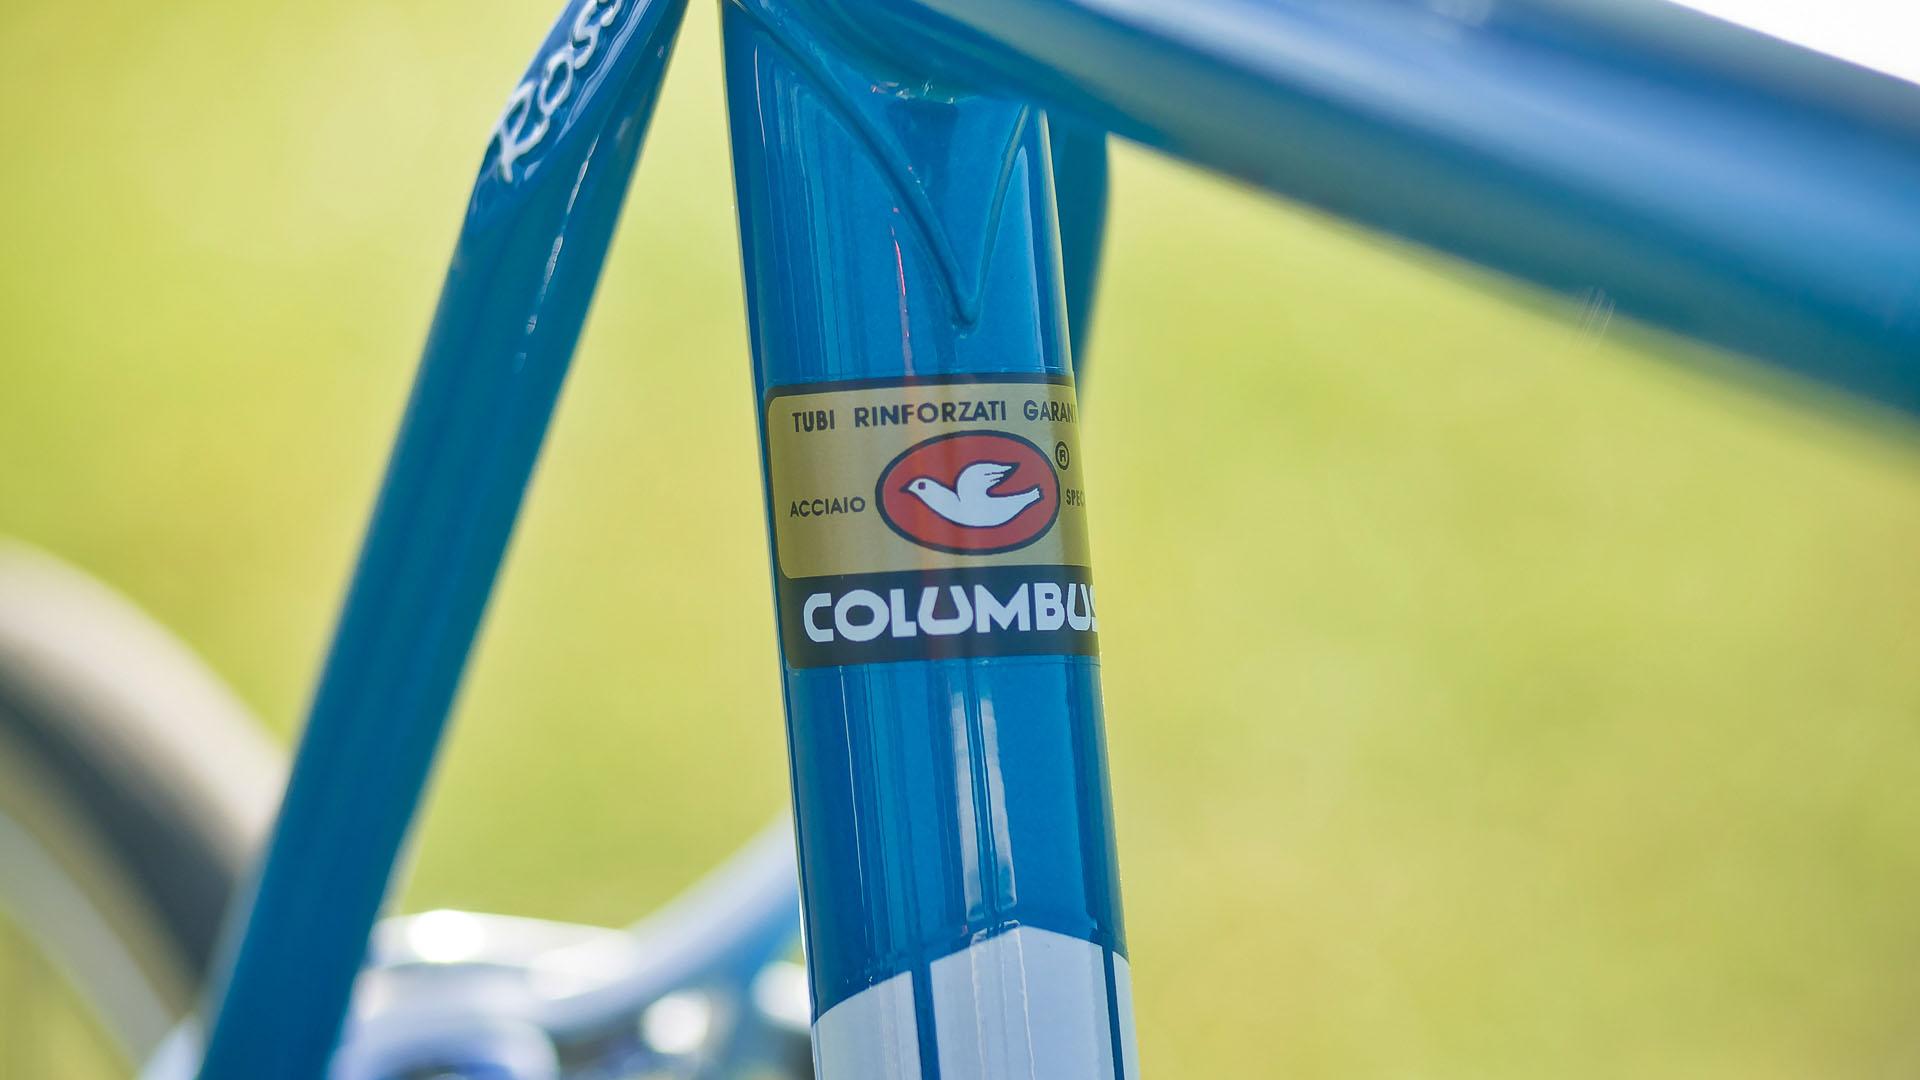 Columbus decal.